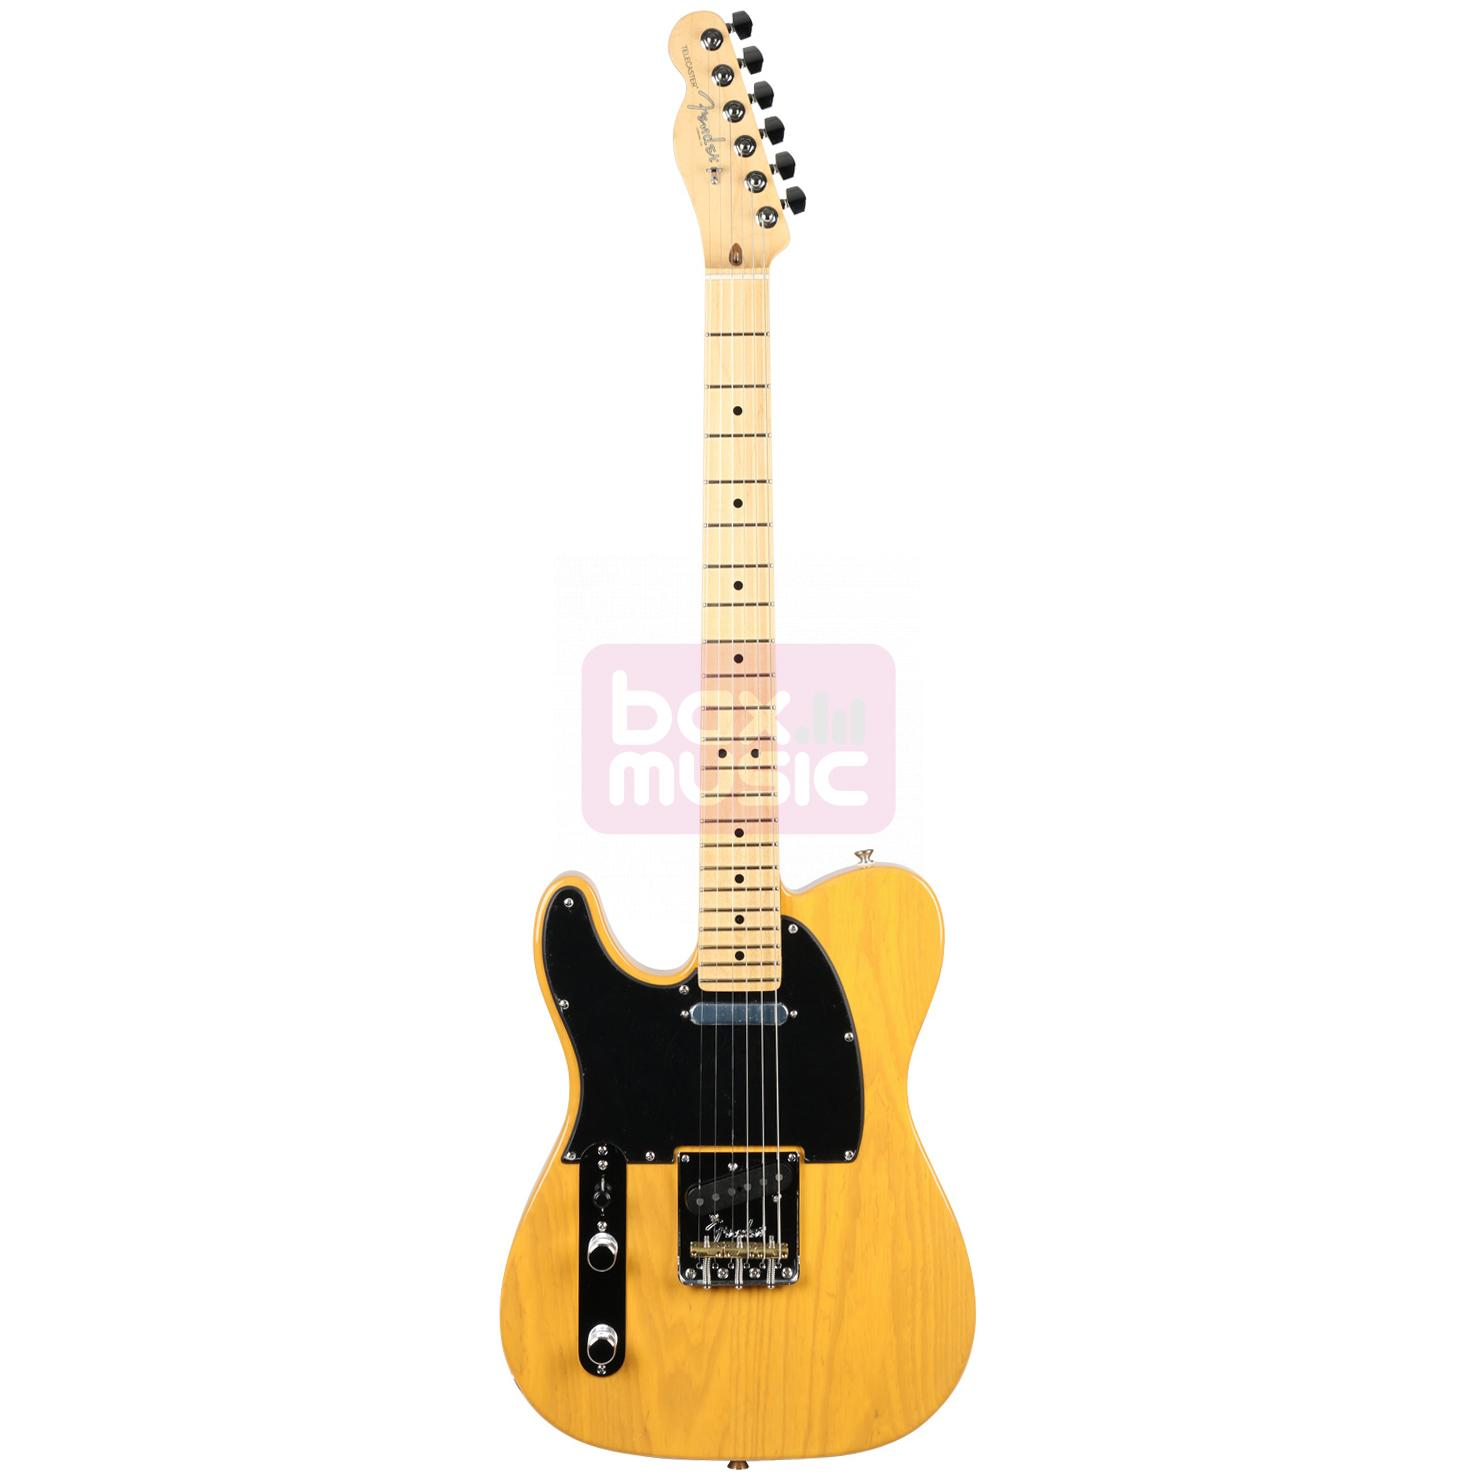 Fender American Pro Telecaster LH Butterscotch Blonde MN